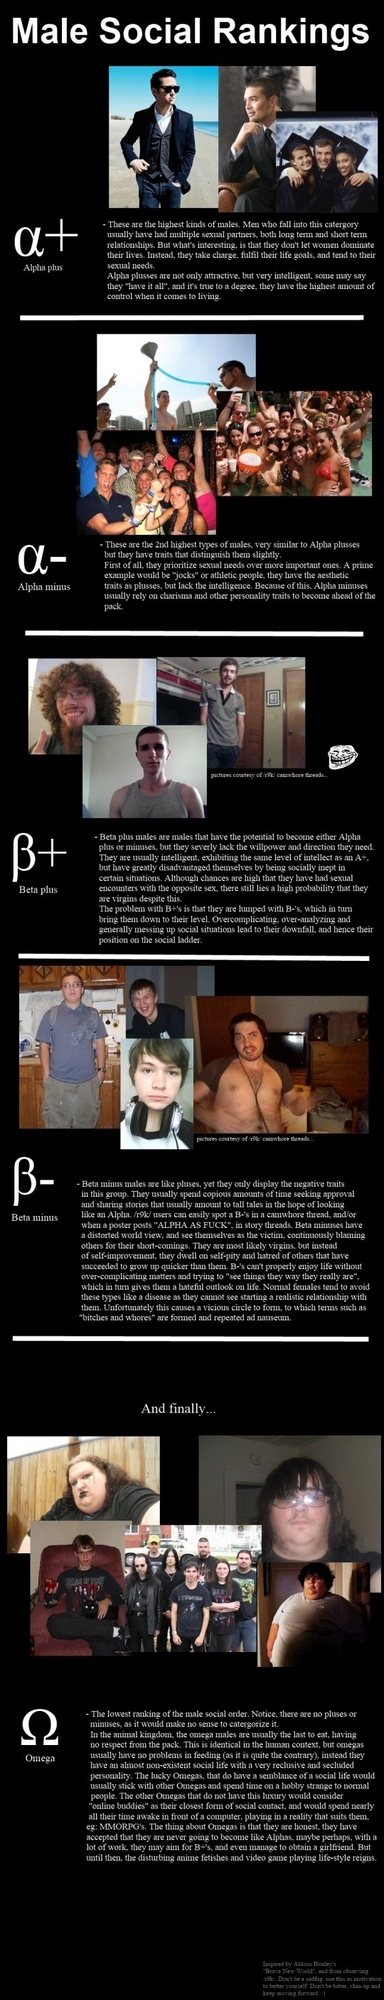 Male Social Rankings